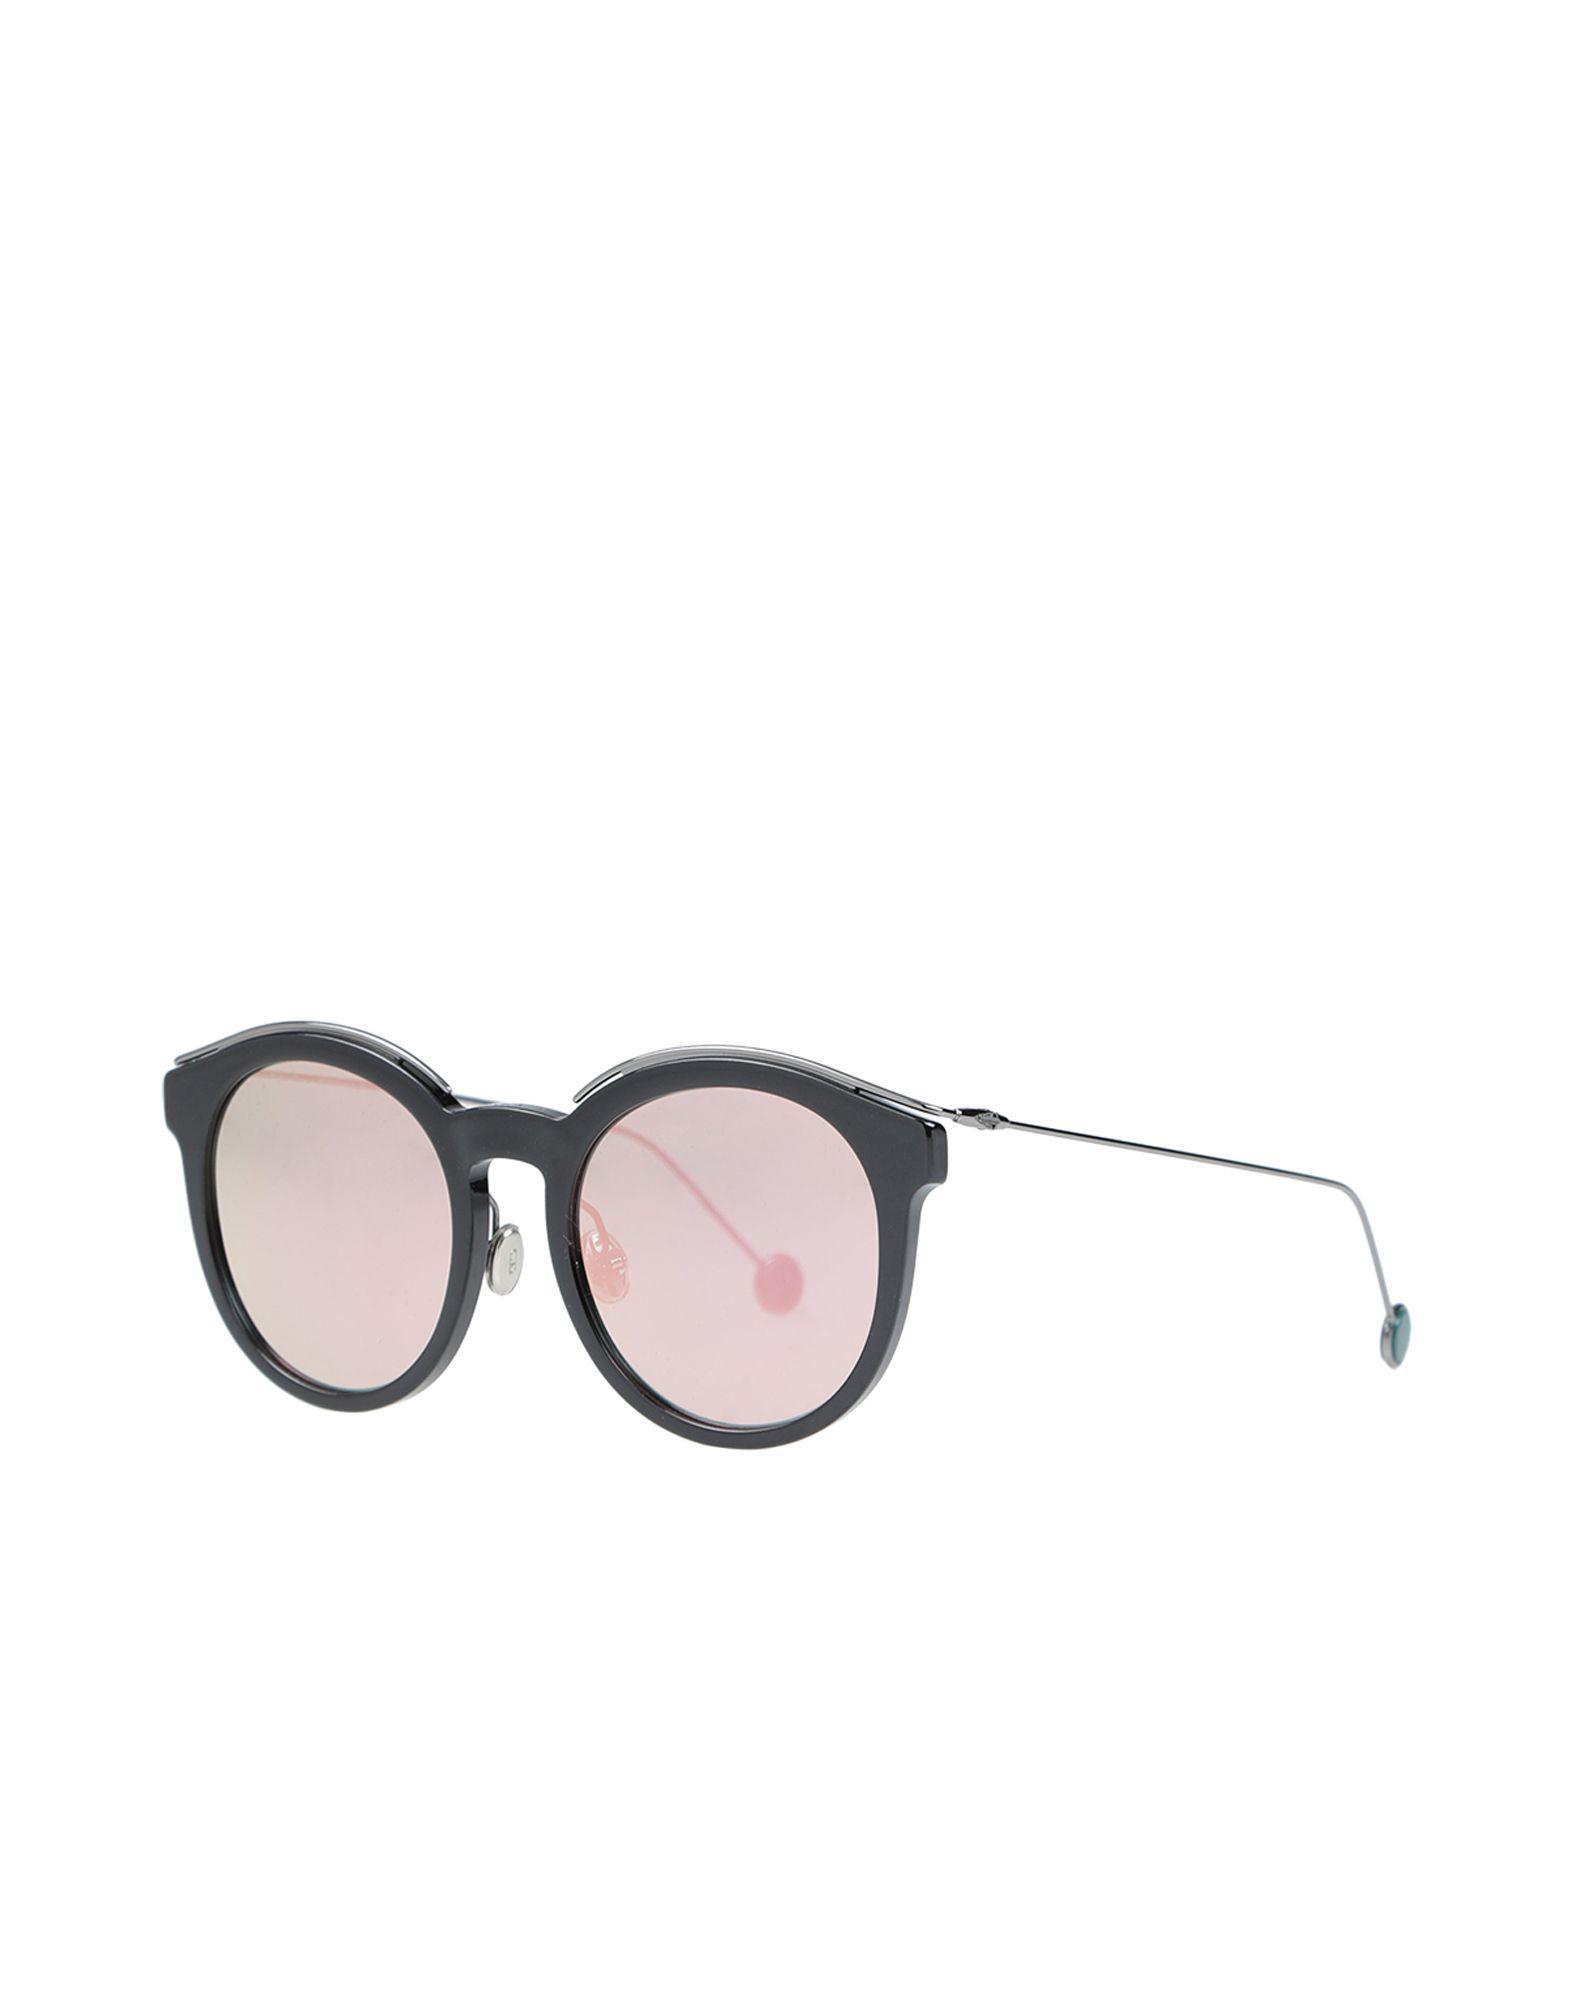 2c2efa2598762 Dior Sunglasses - Women Dior Sunglasses online on YOOX Hong Kong ...